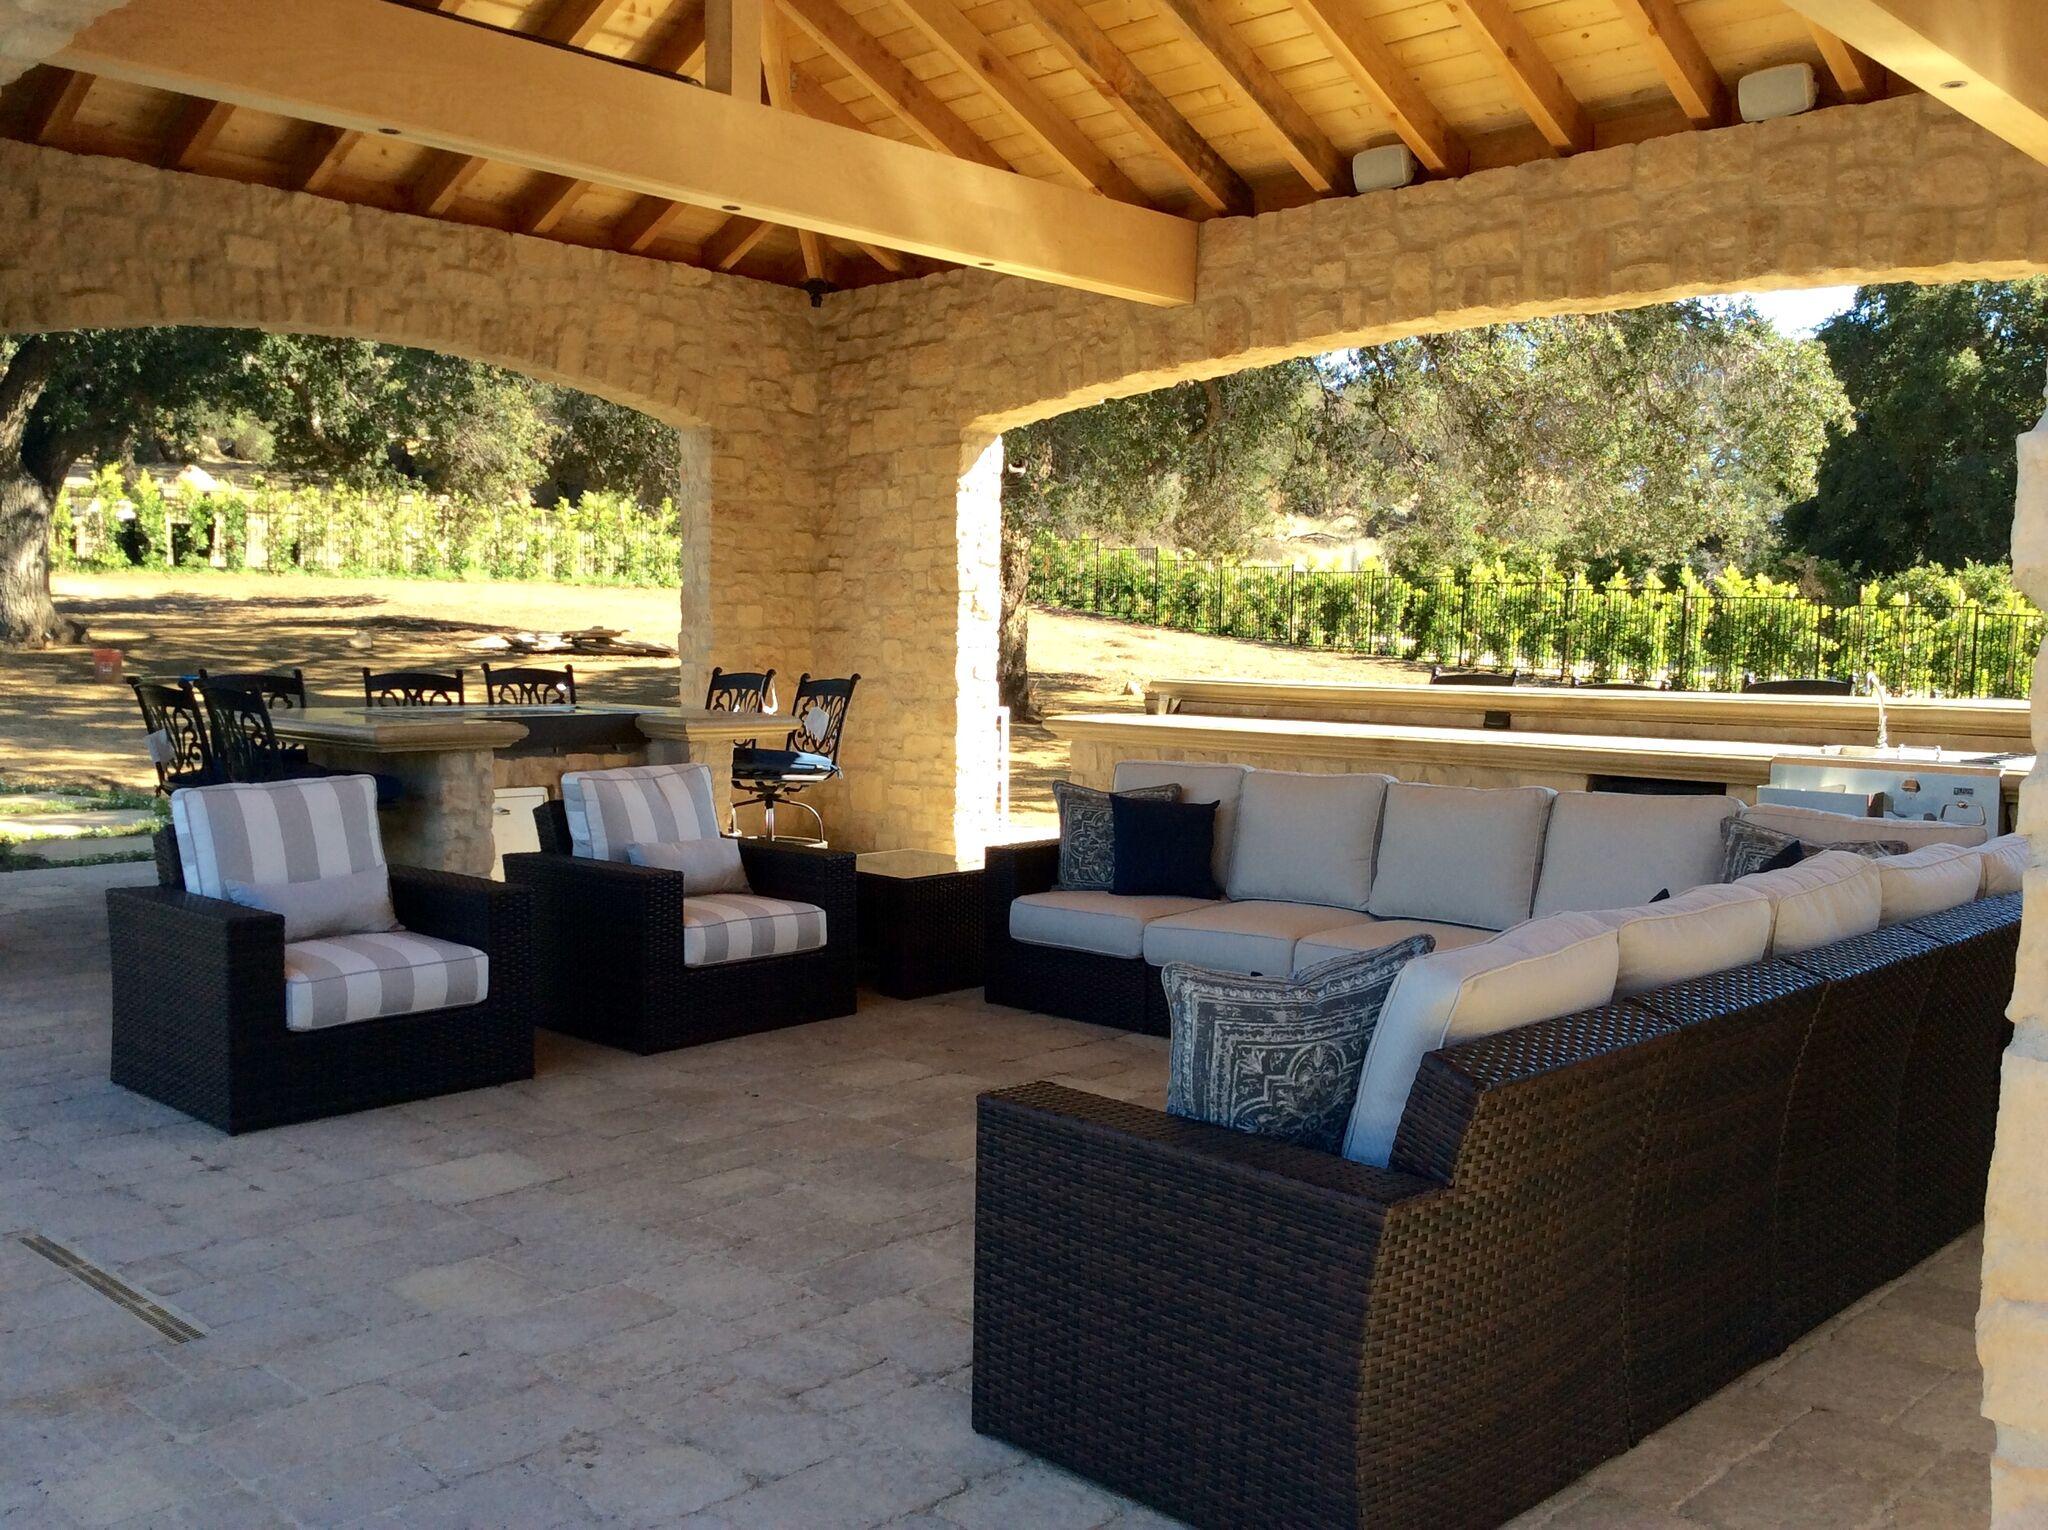 eastern outdoor furnishings totowa nj easy outdoor kitchen